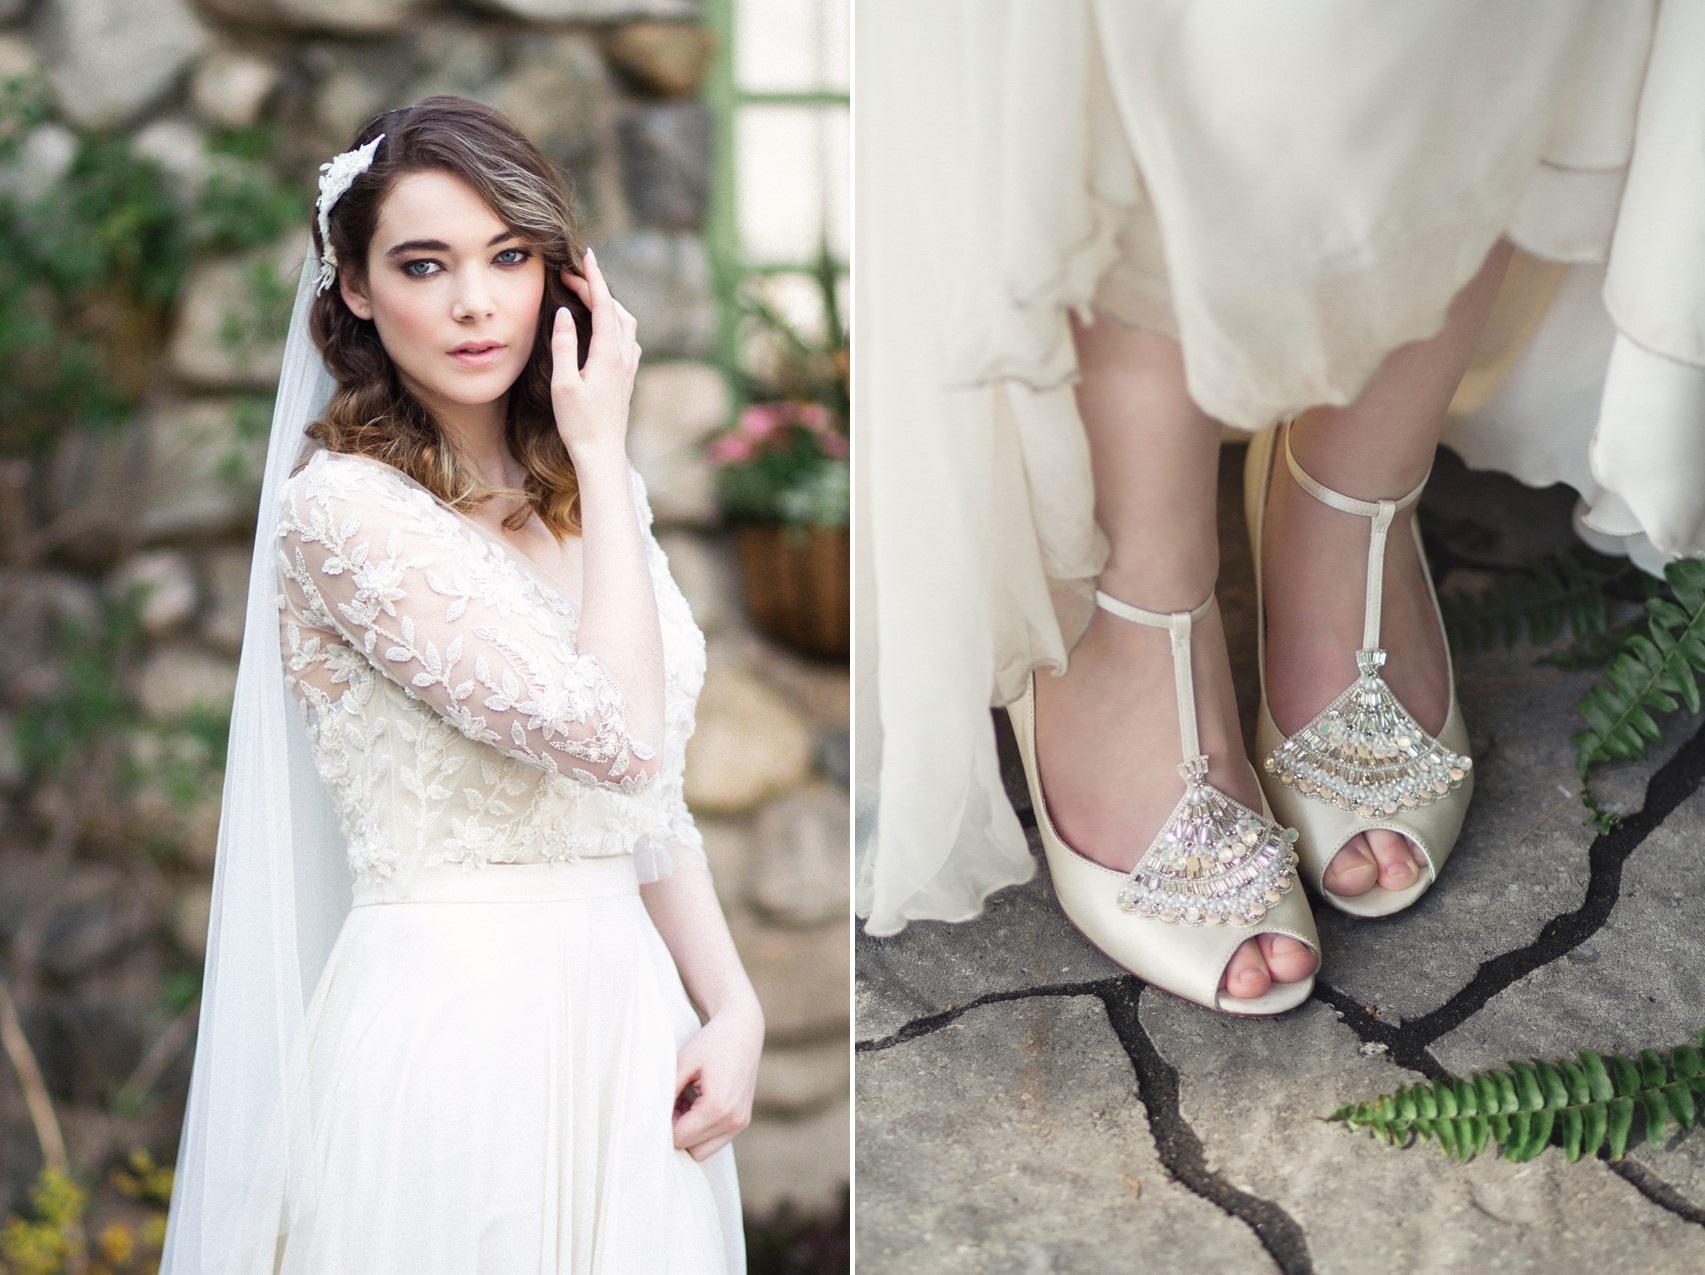 Bridal Veil & Bridal Shoes - Romantic Al Fresco Wedding Ideas Inspired by Tuscany